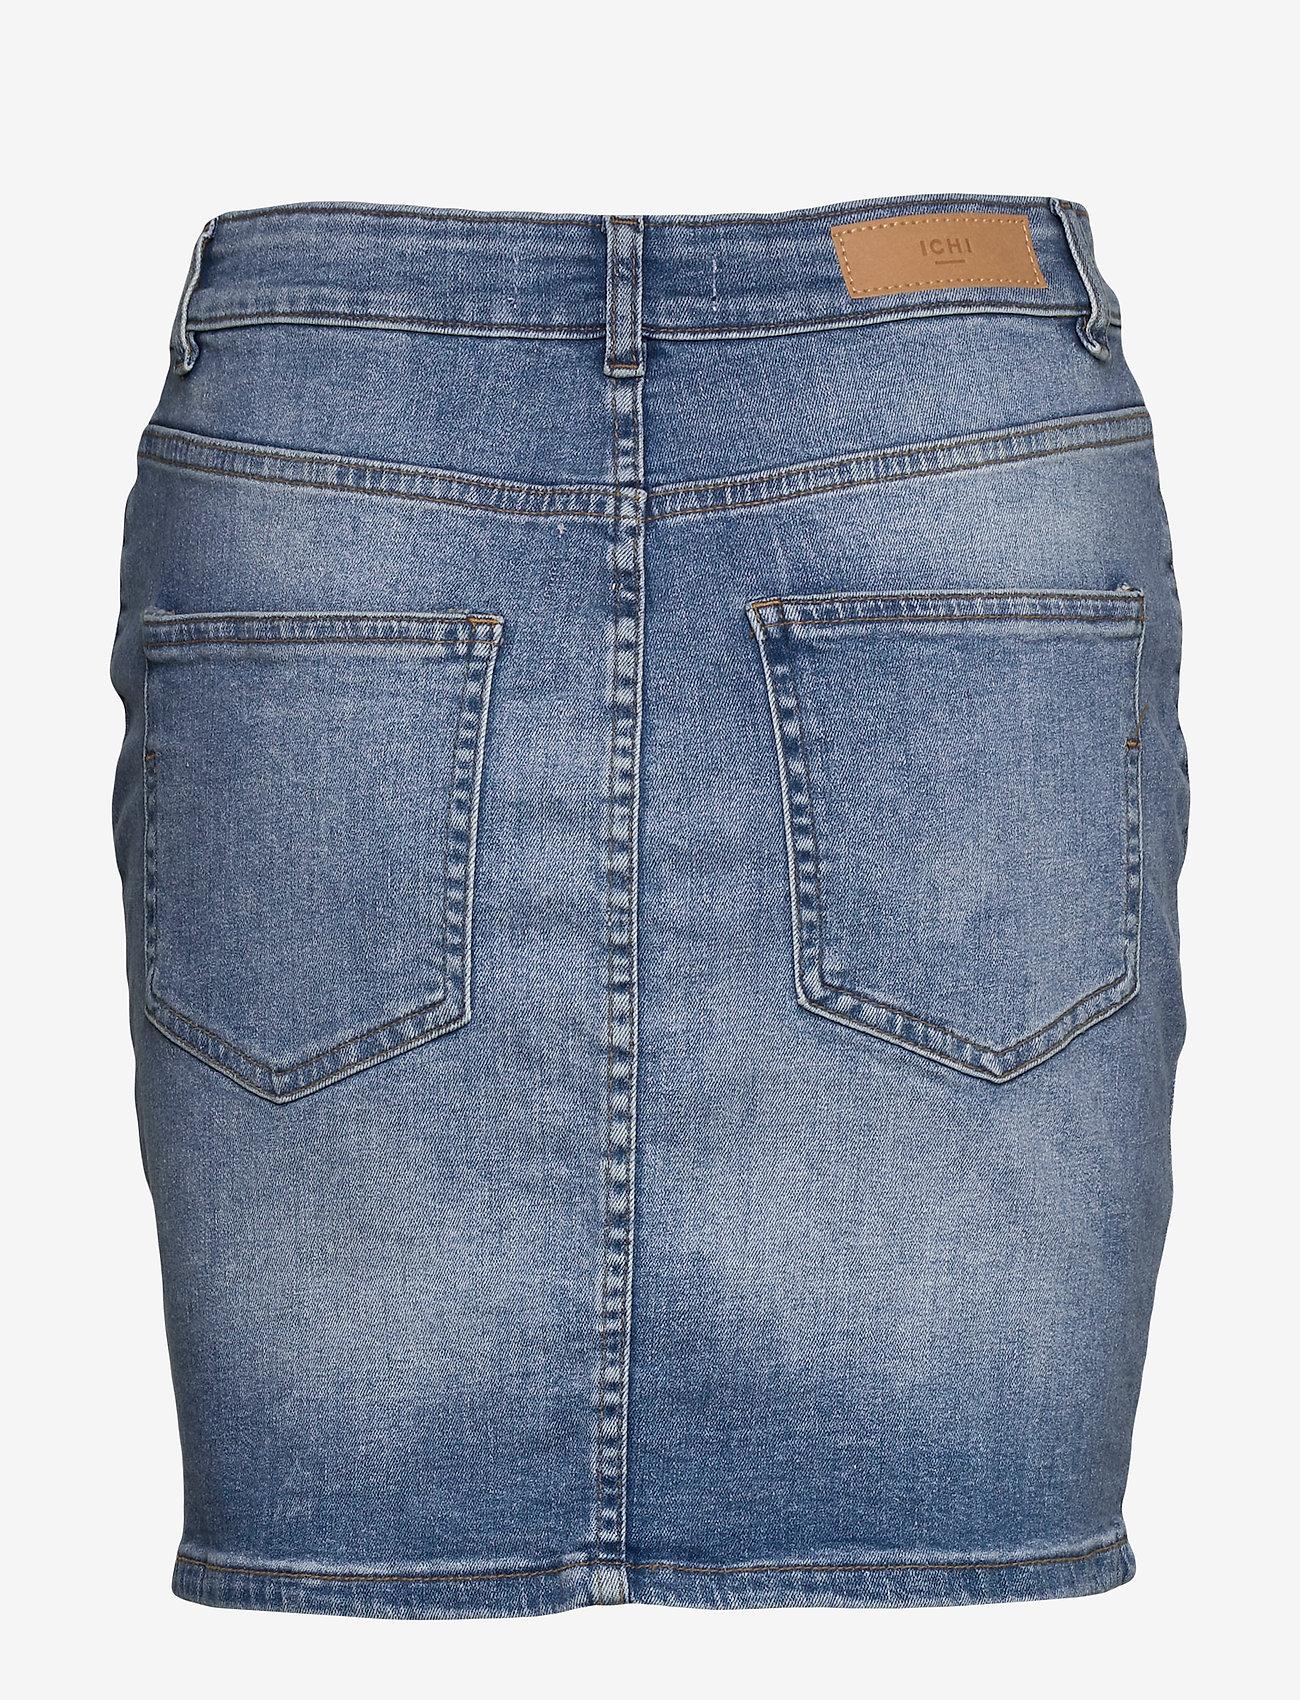 ICHI - IHTWIGGY SK - denim skirts - light blue - 1